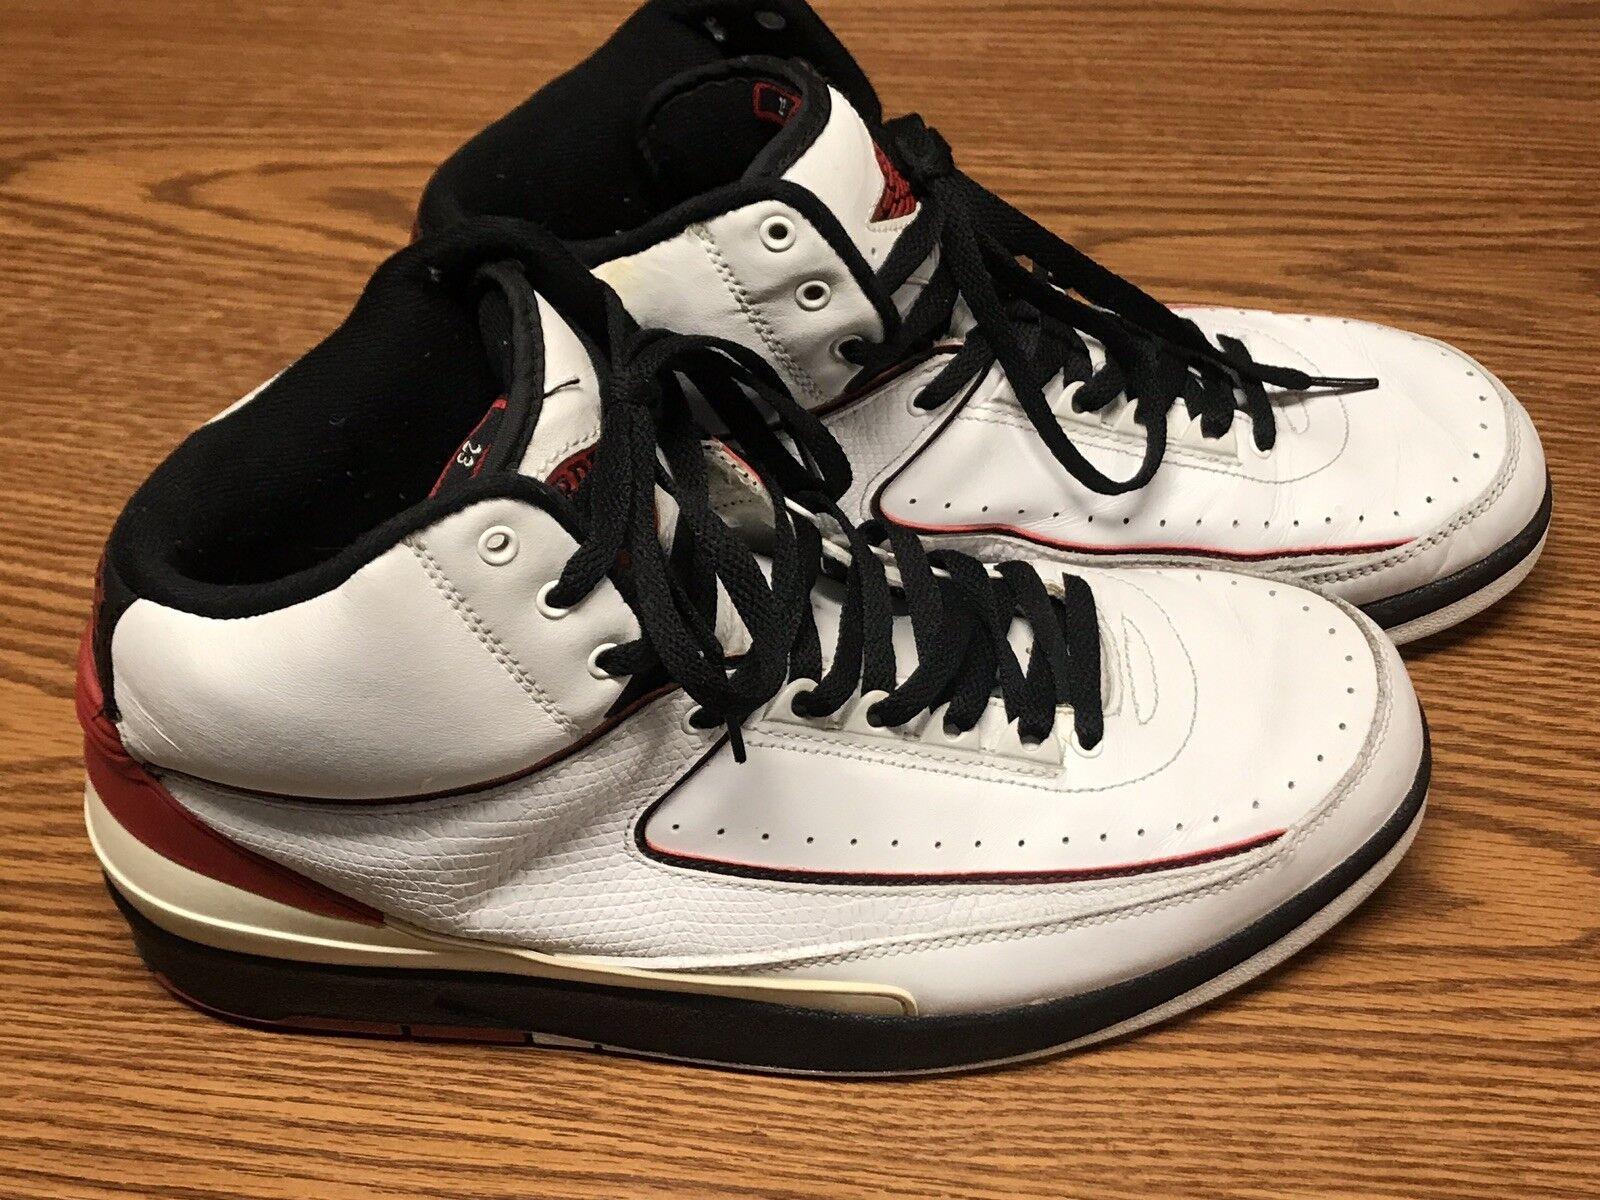 Nike 308308-161 2004  Air Jordan 2 Retro White Varsity Red Black Sz 11.5